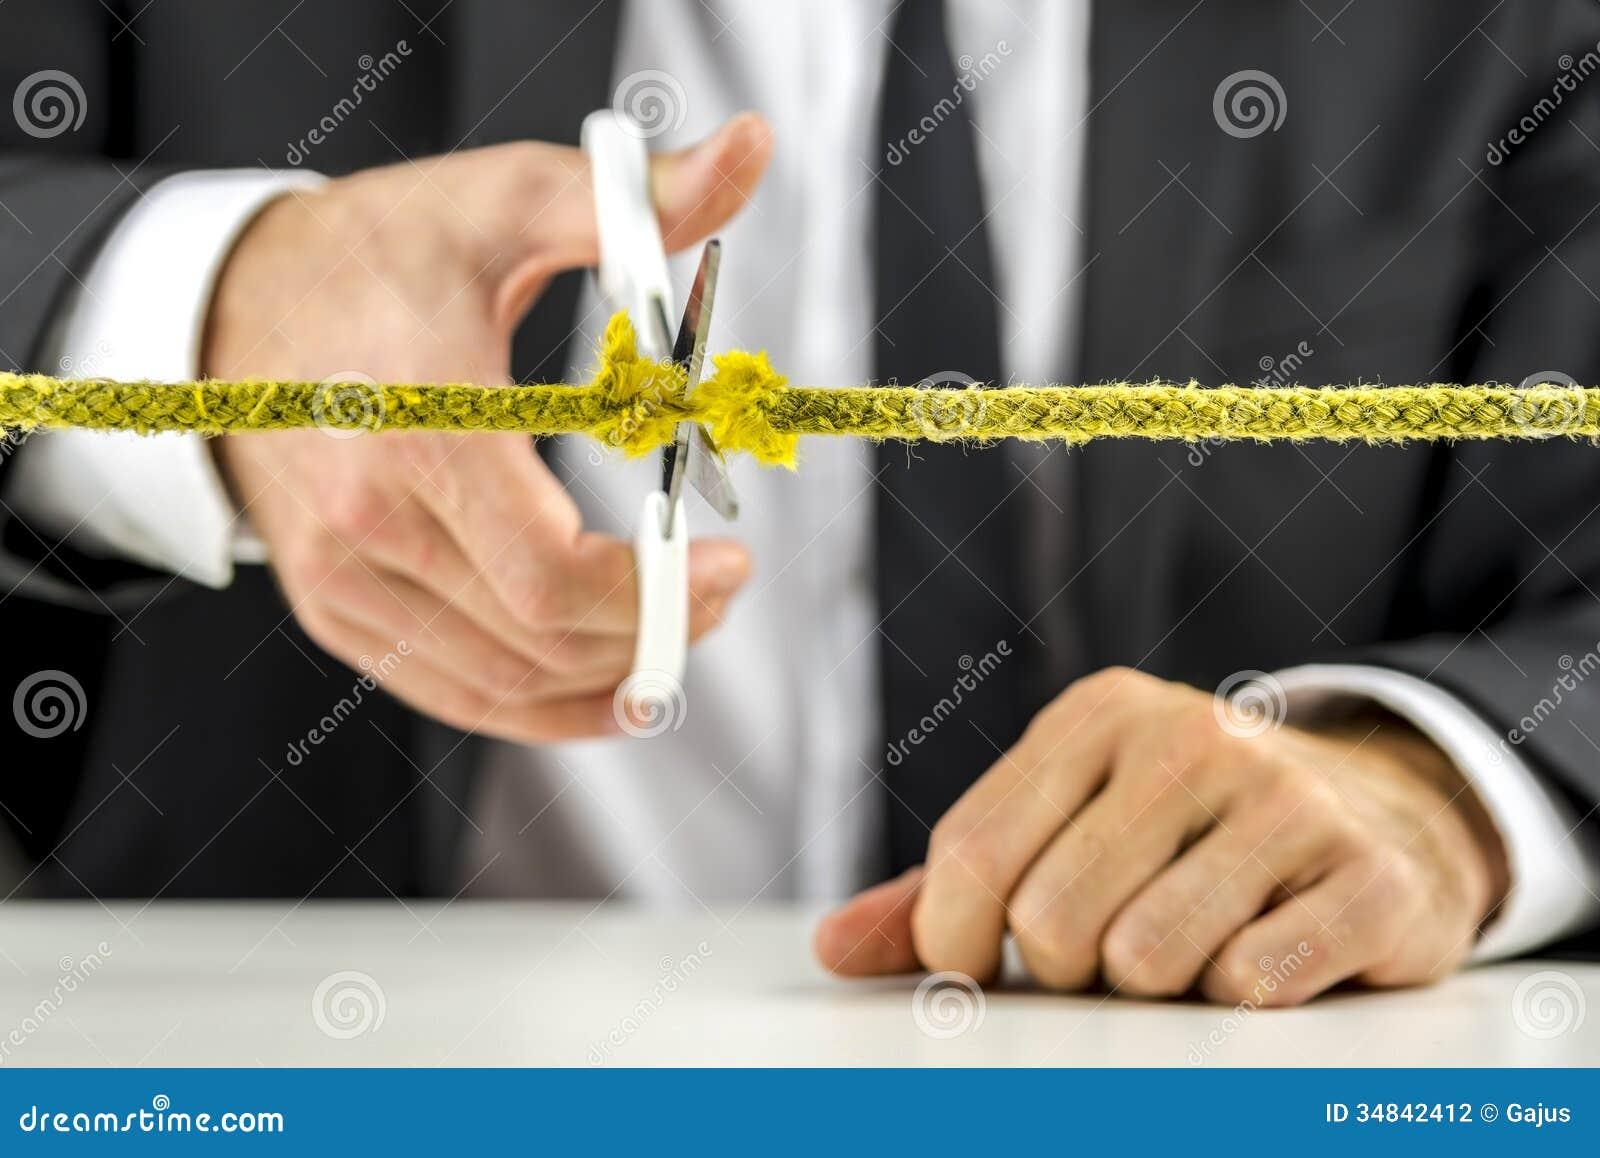 Businessman cutting yellow rope